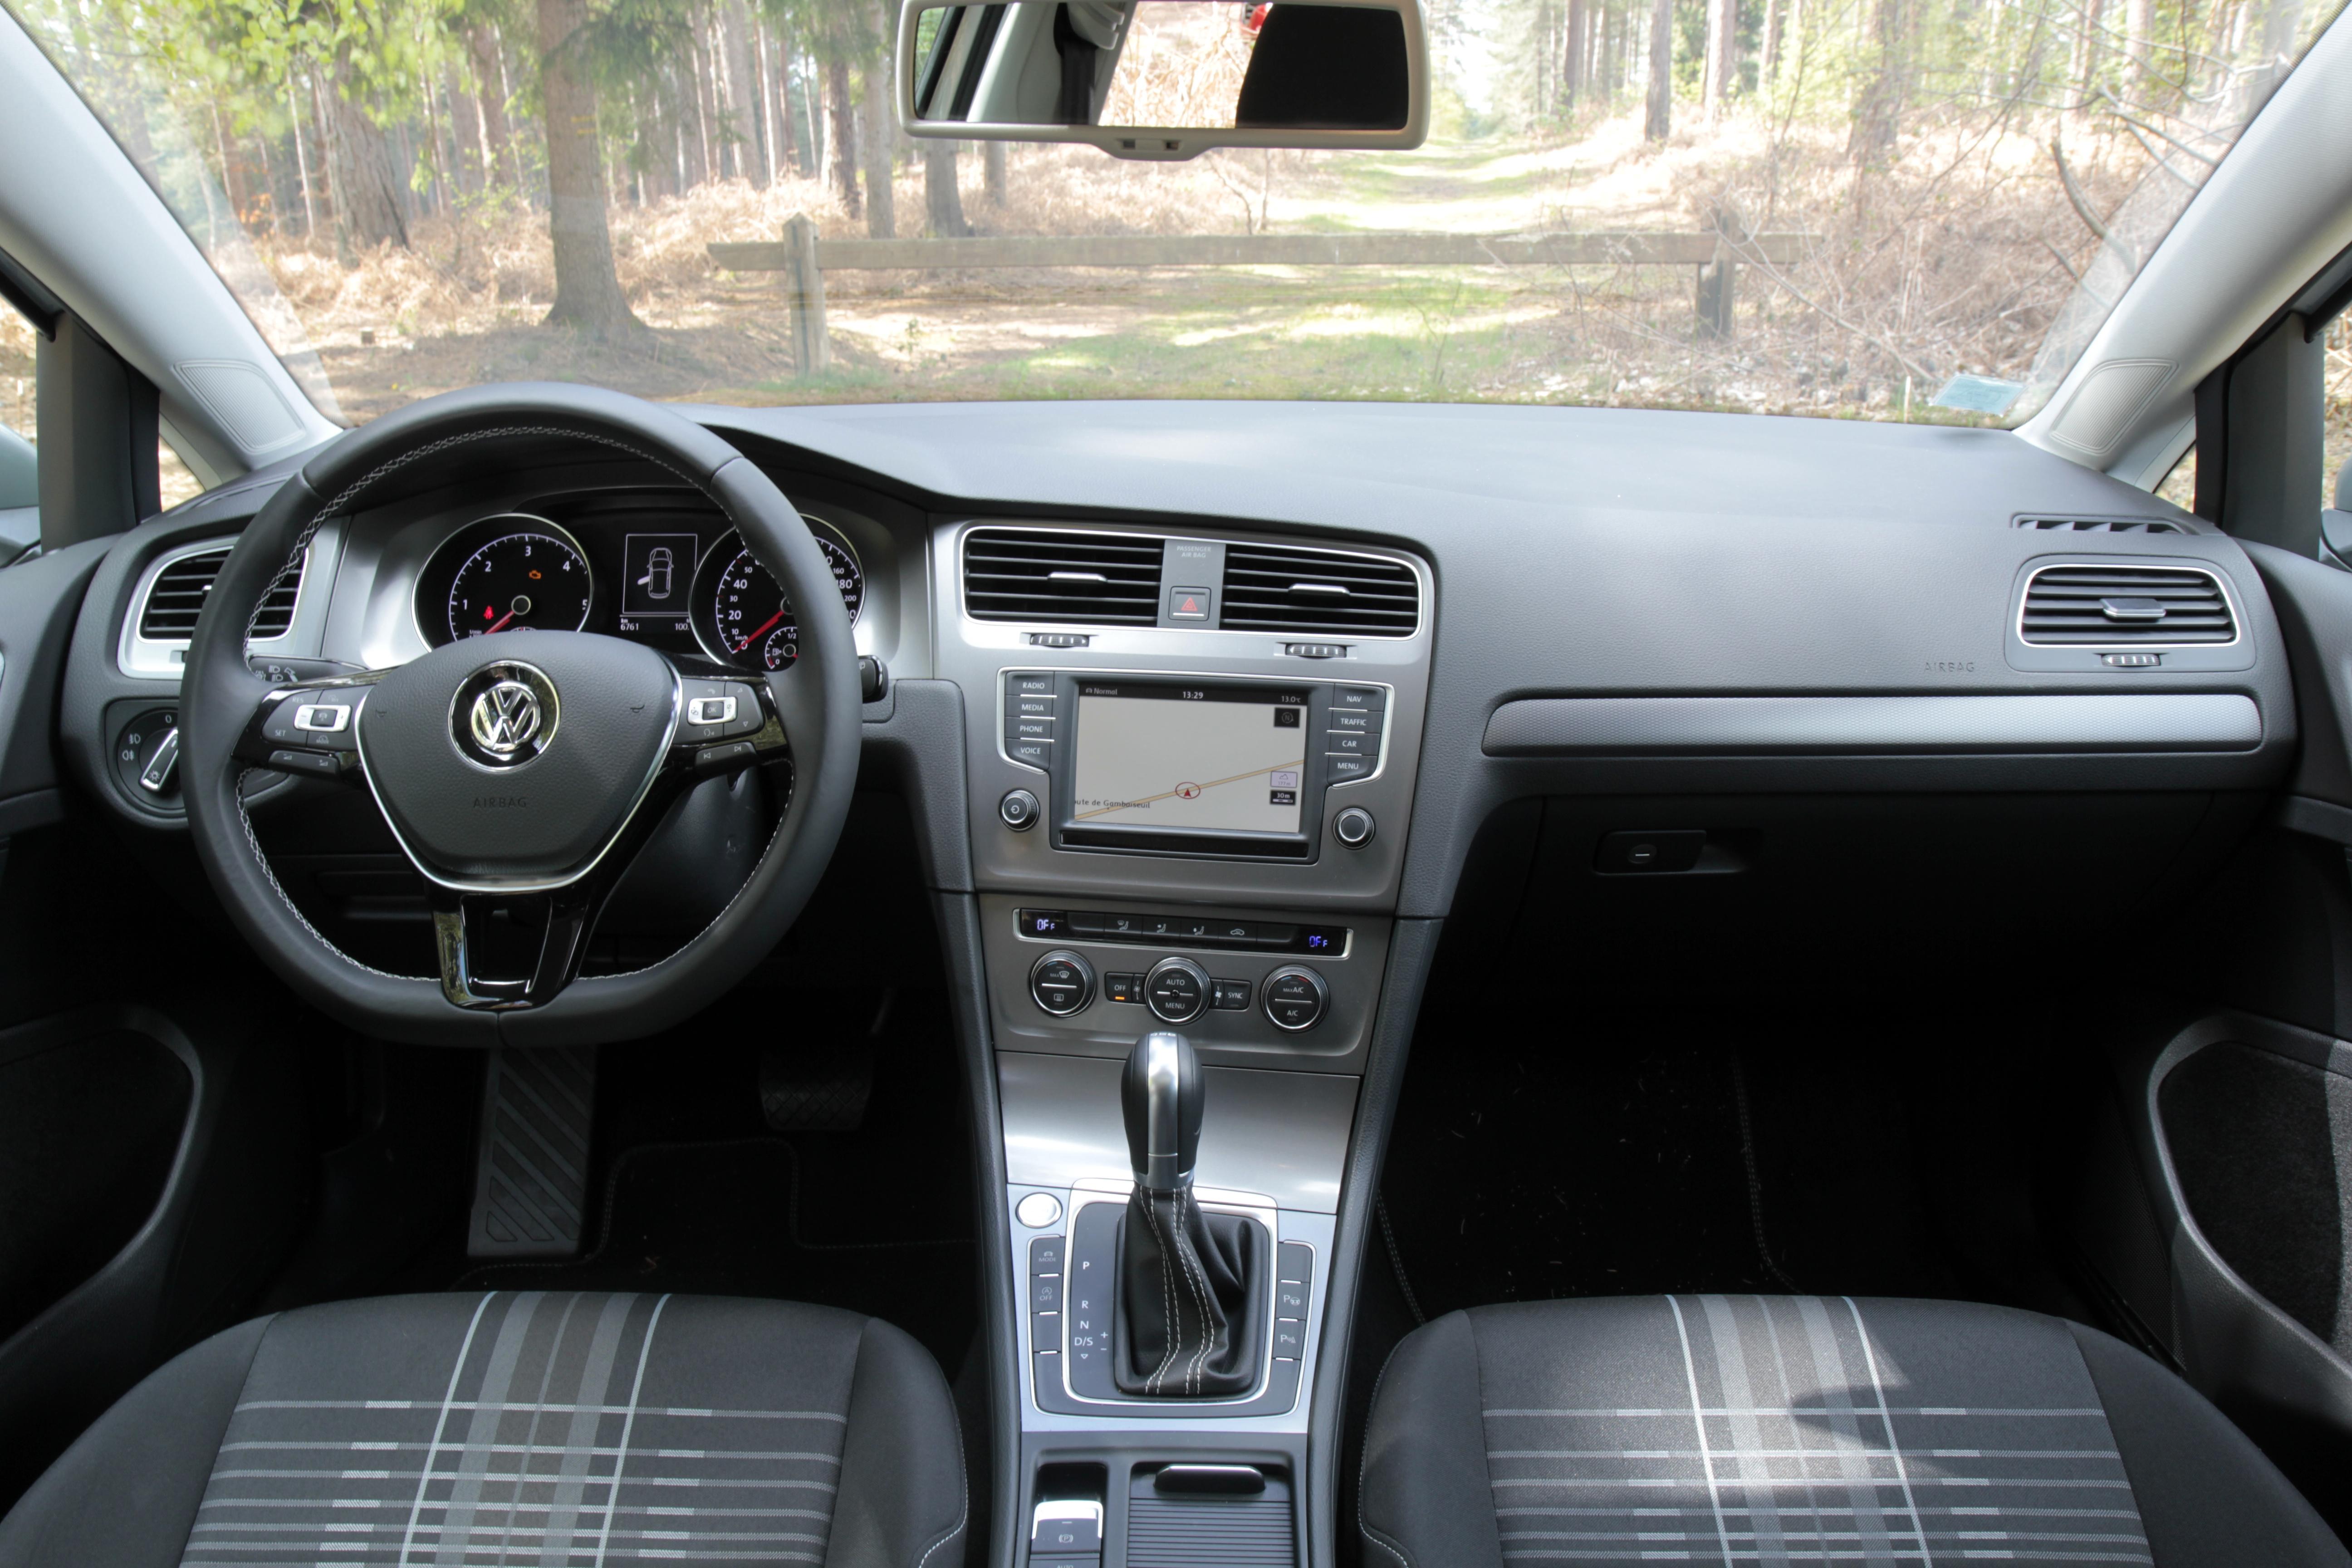 Comparativa: Opel Astra VS Renault Megane VS Volkswagen Golf  S0-comparatif-video-renault-megane-vs-opel-astra-vs-volkswagen-golf-la-deuxieme-tentative-sera-t-elle-la-bonne-378228